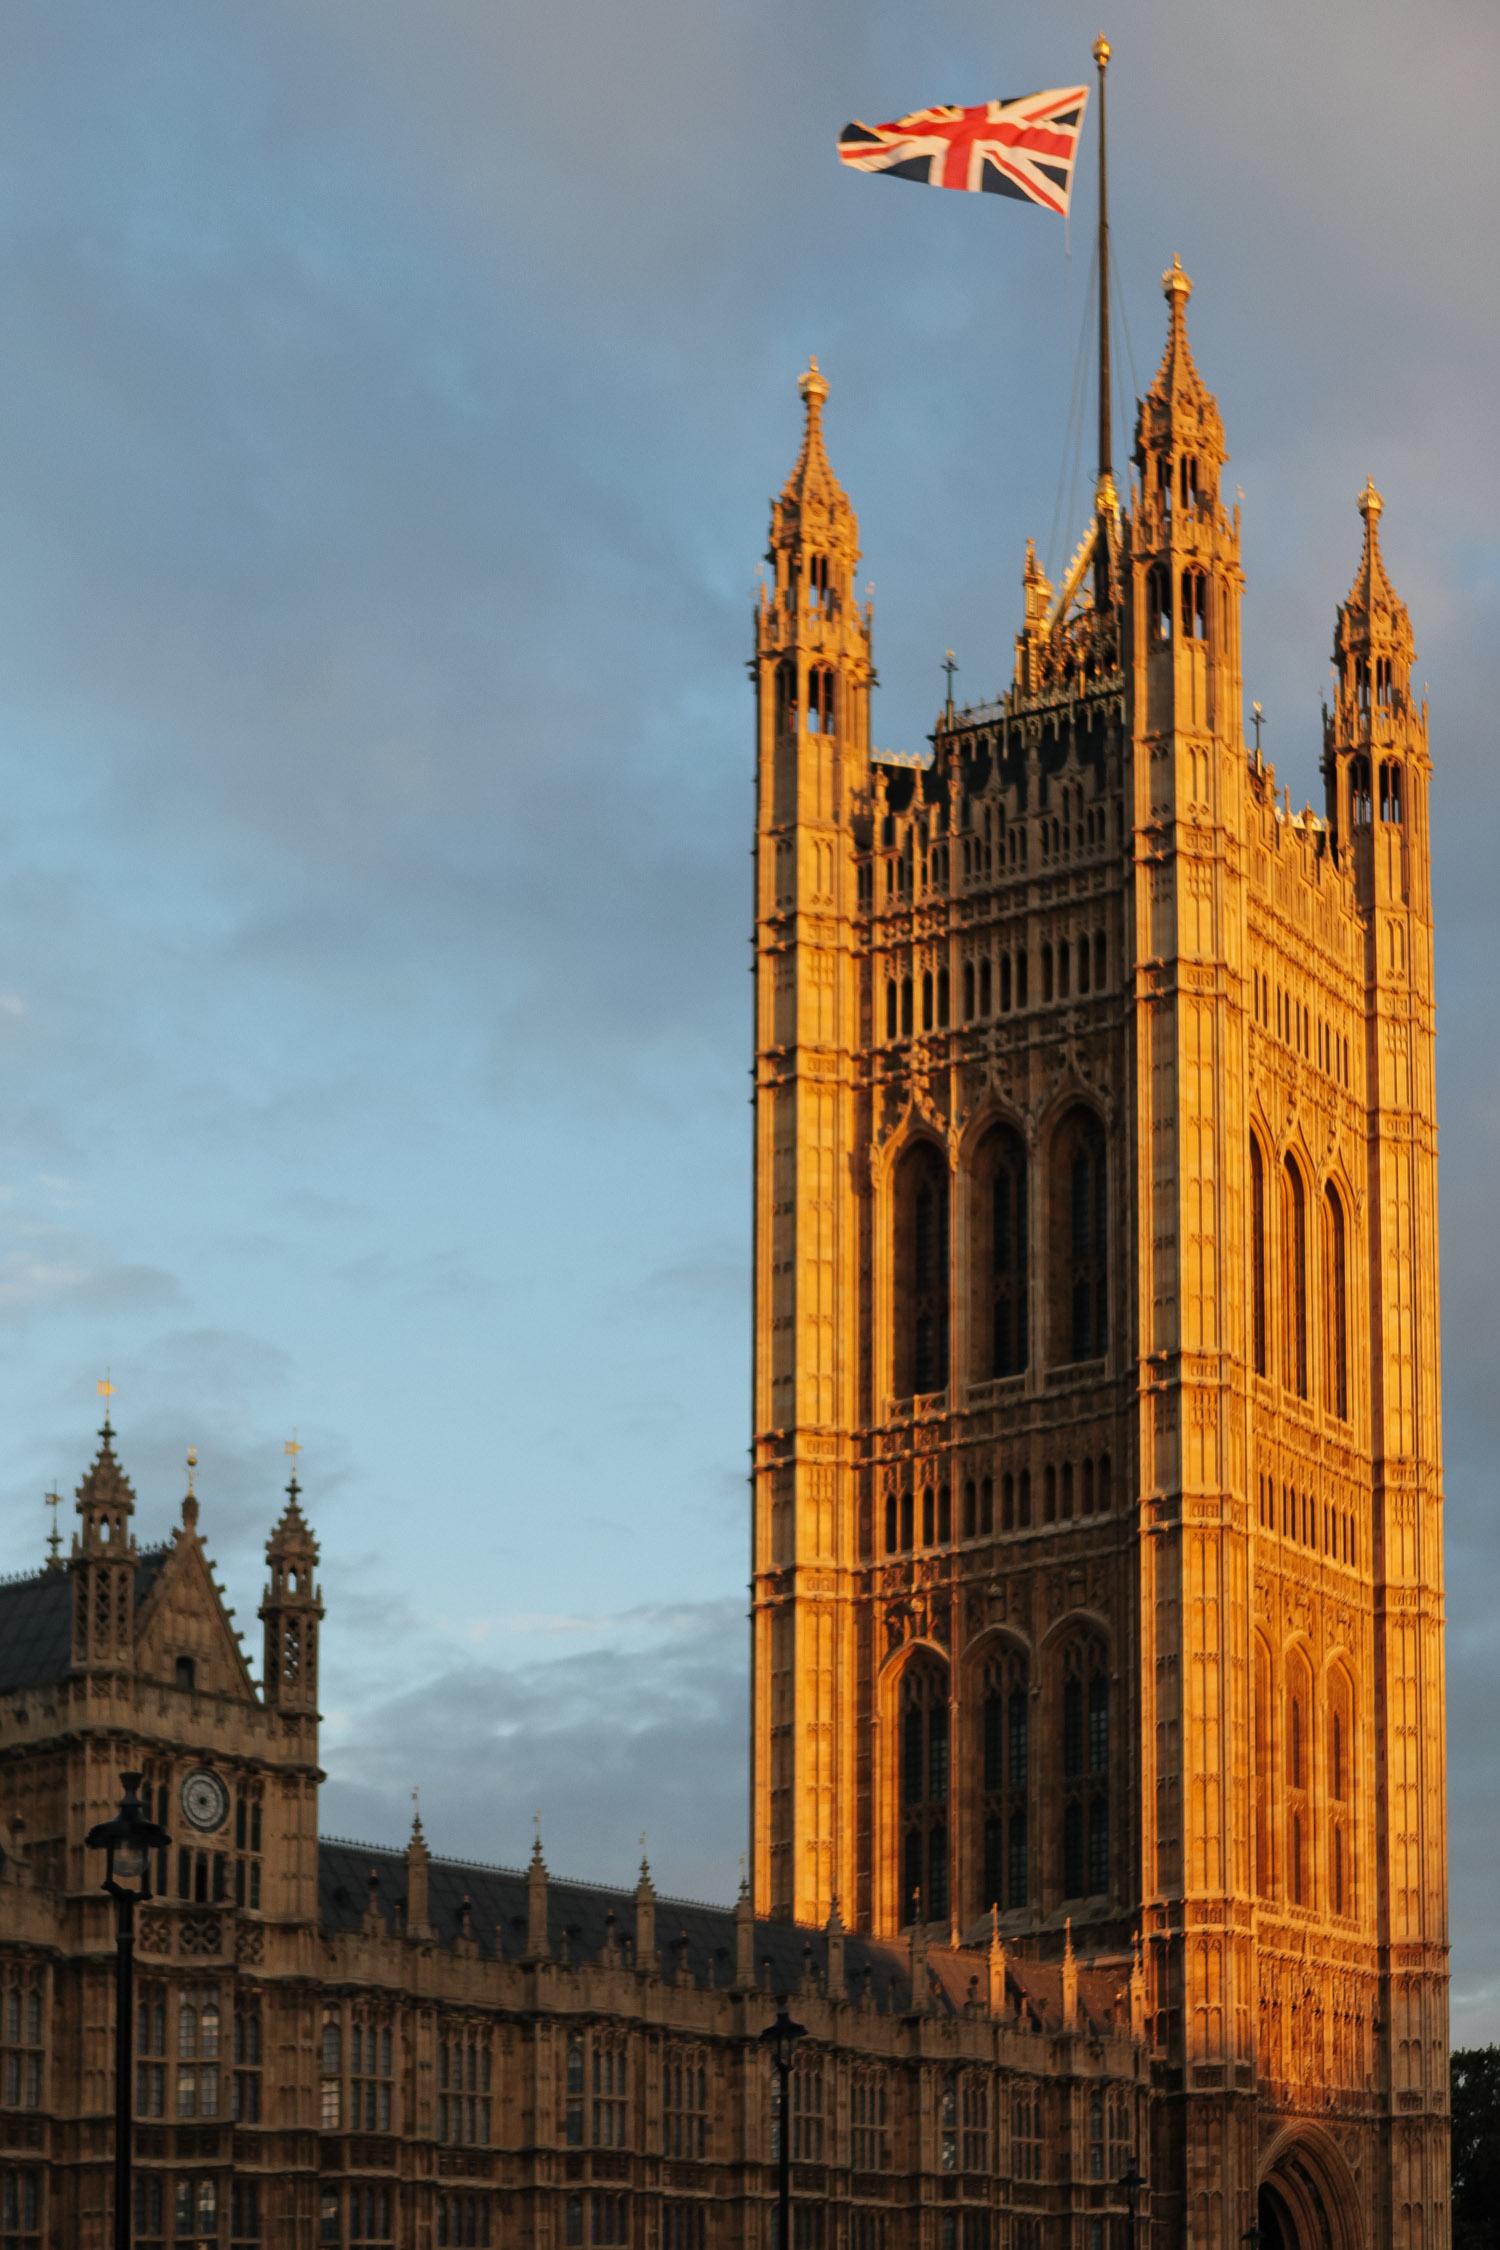 SqSpPort-London-2962.jpg